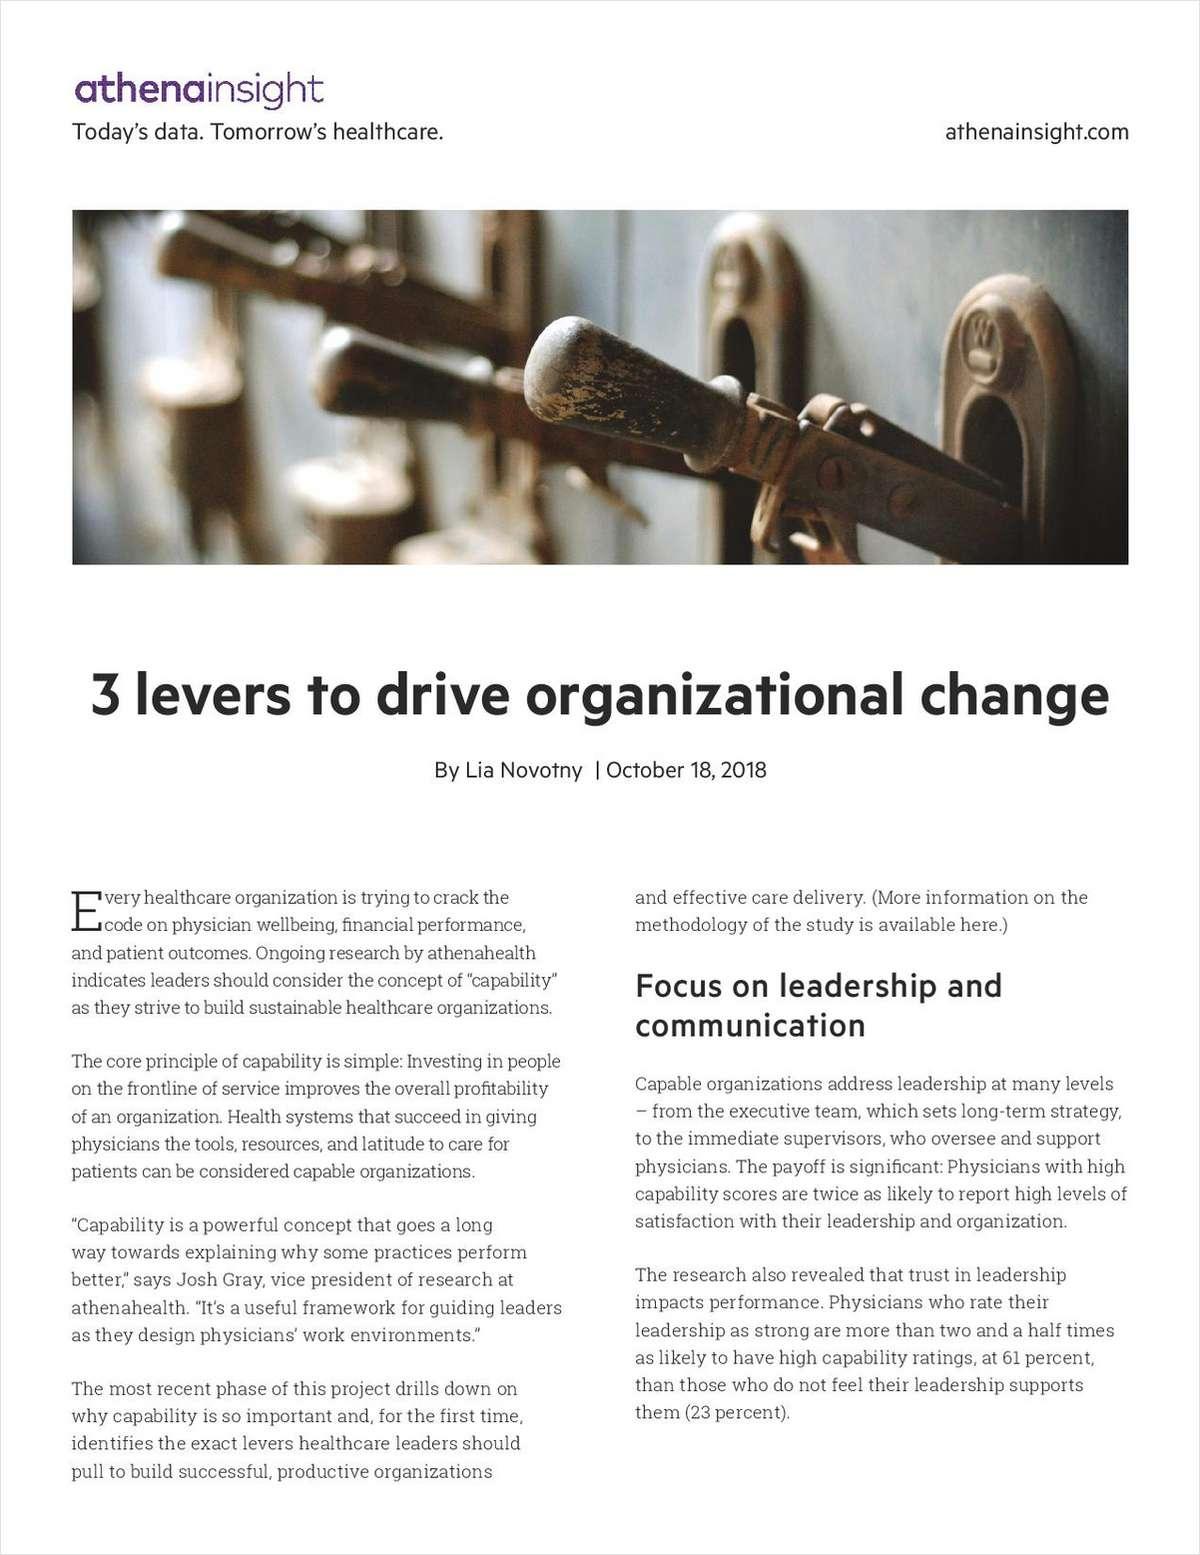 3 Levers to Drive Organizational Change